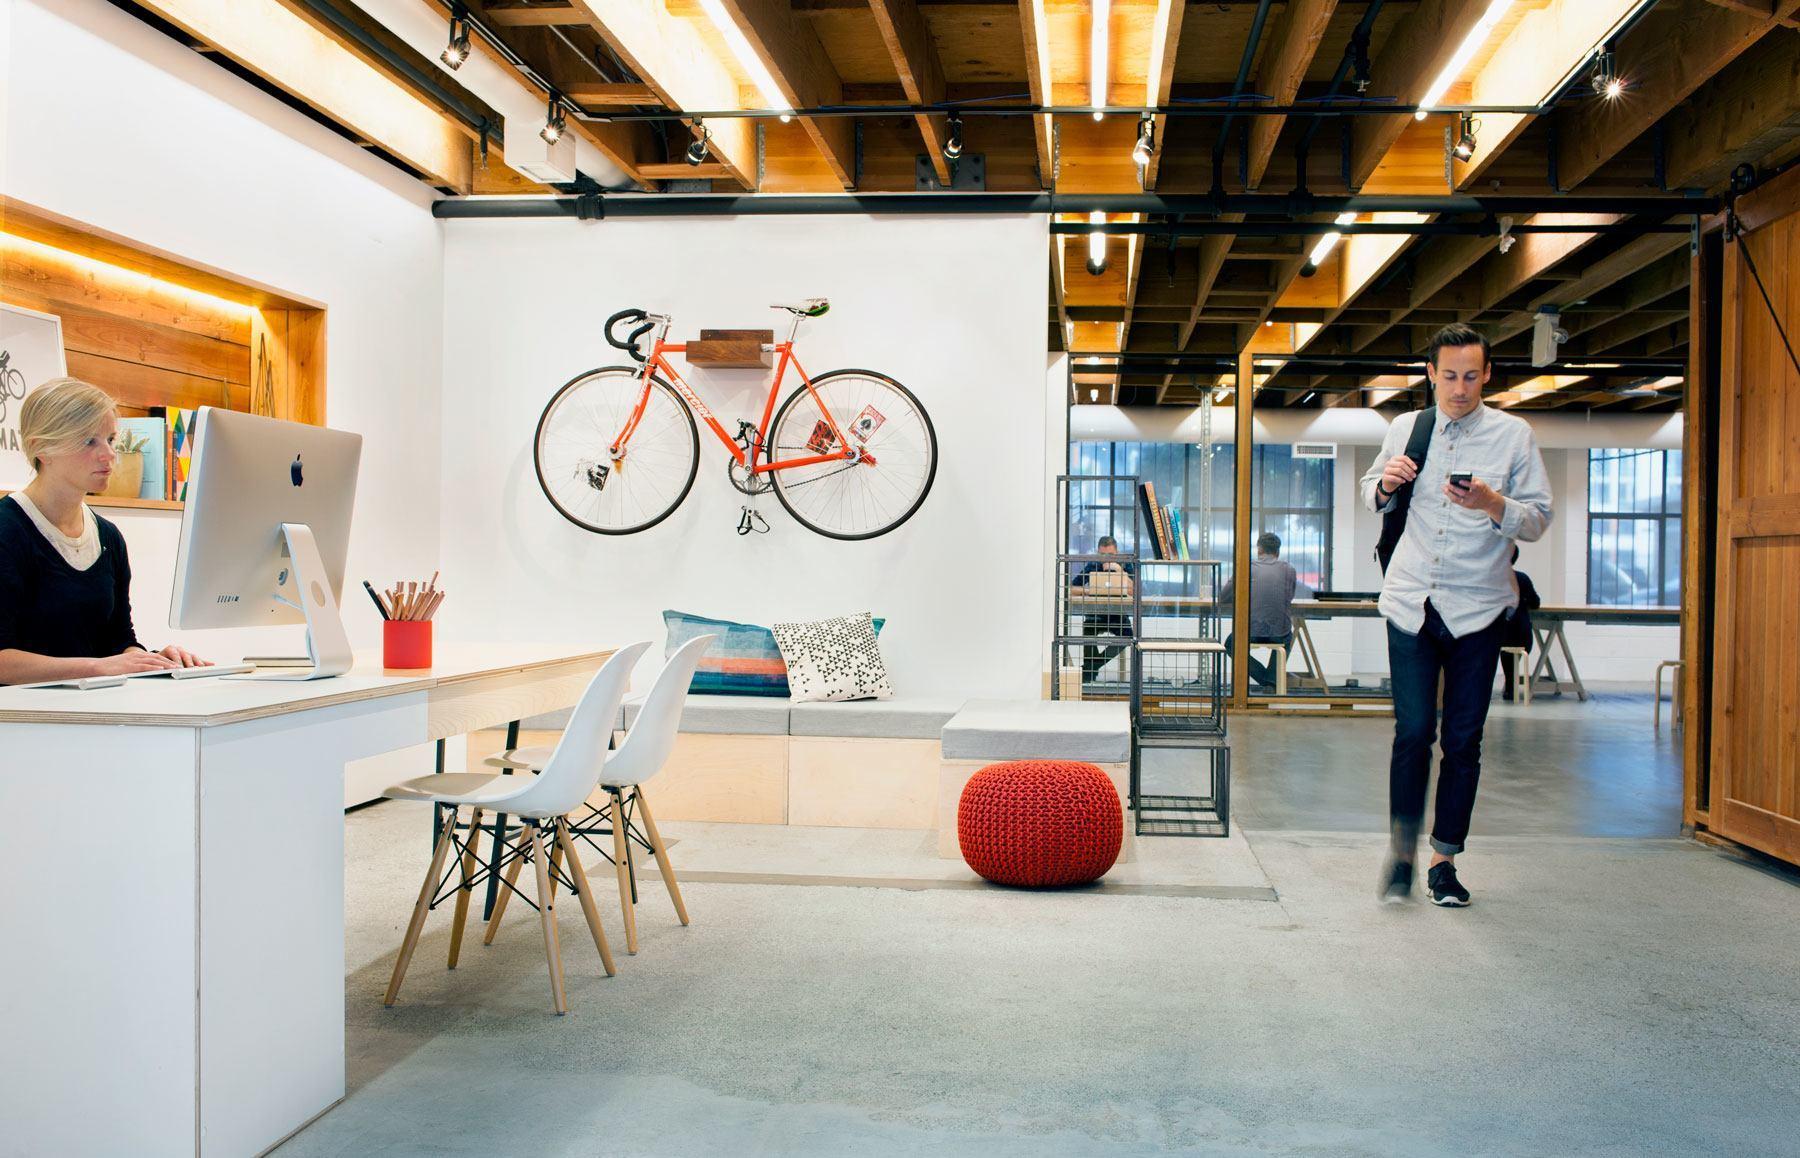 Take a Tour of Postmates' Beautiful San Francisco Office